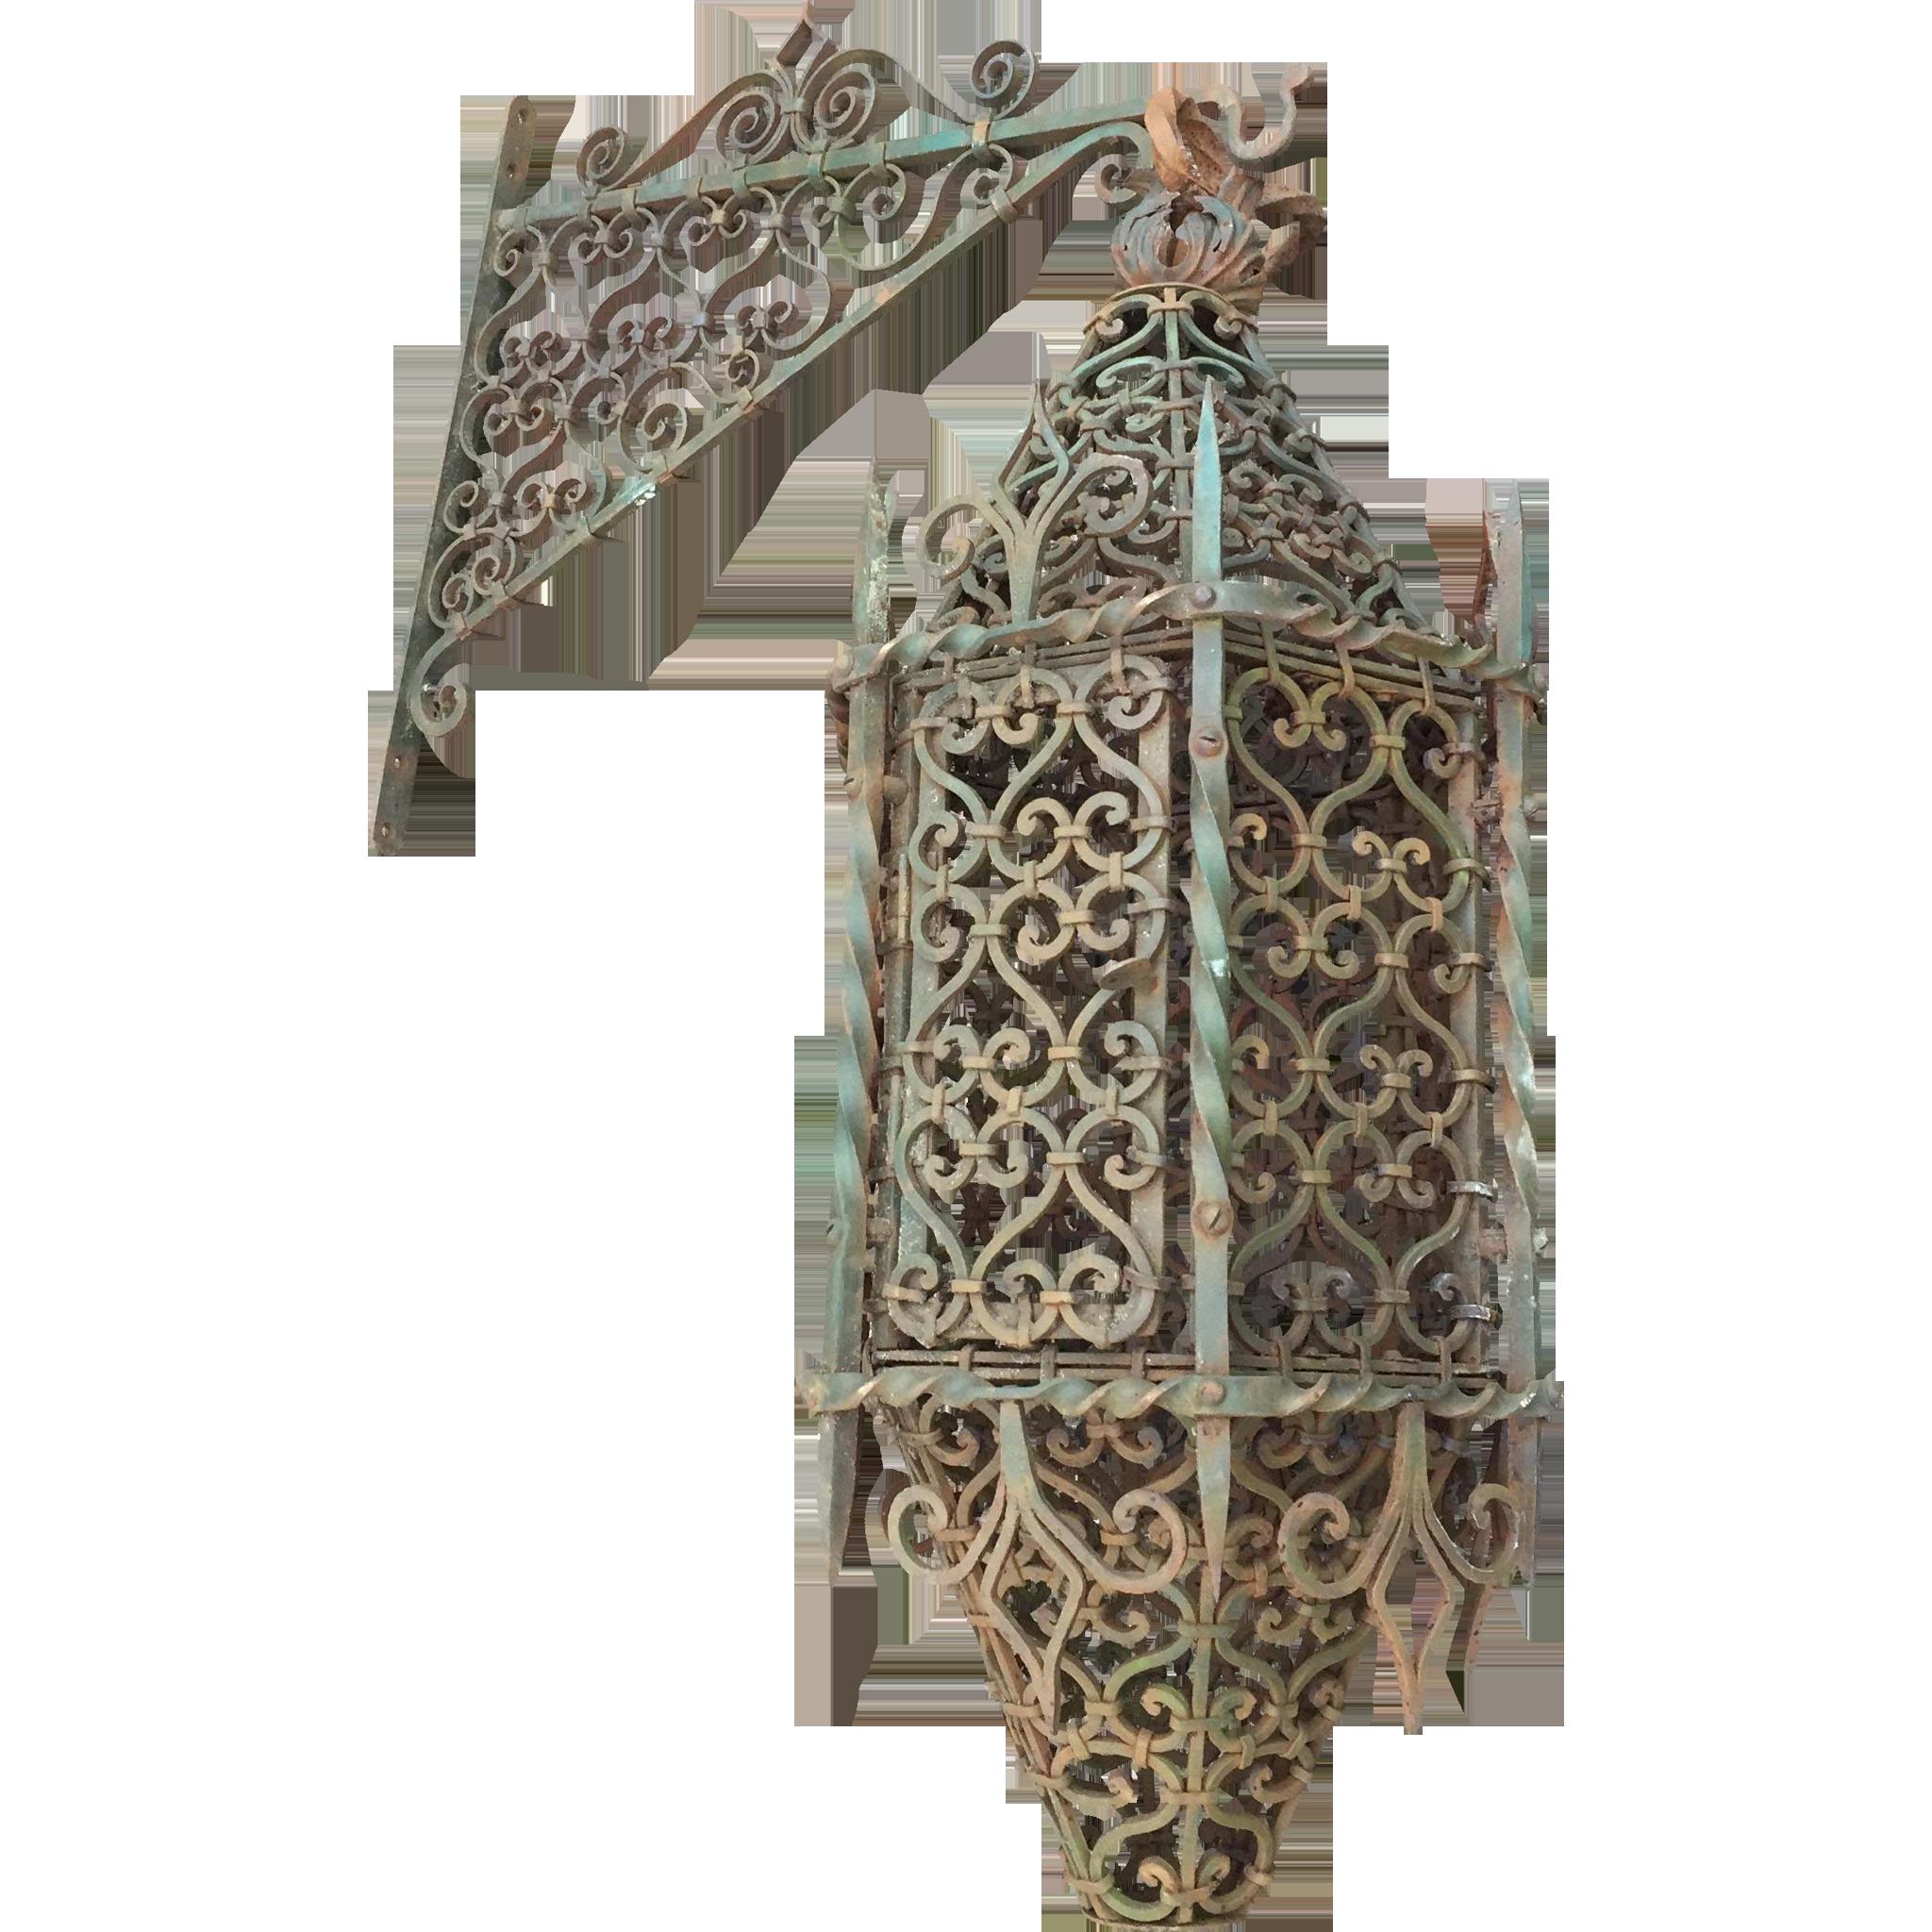 Huge France iron castle lantern with bracket